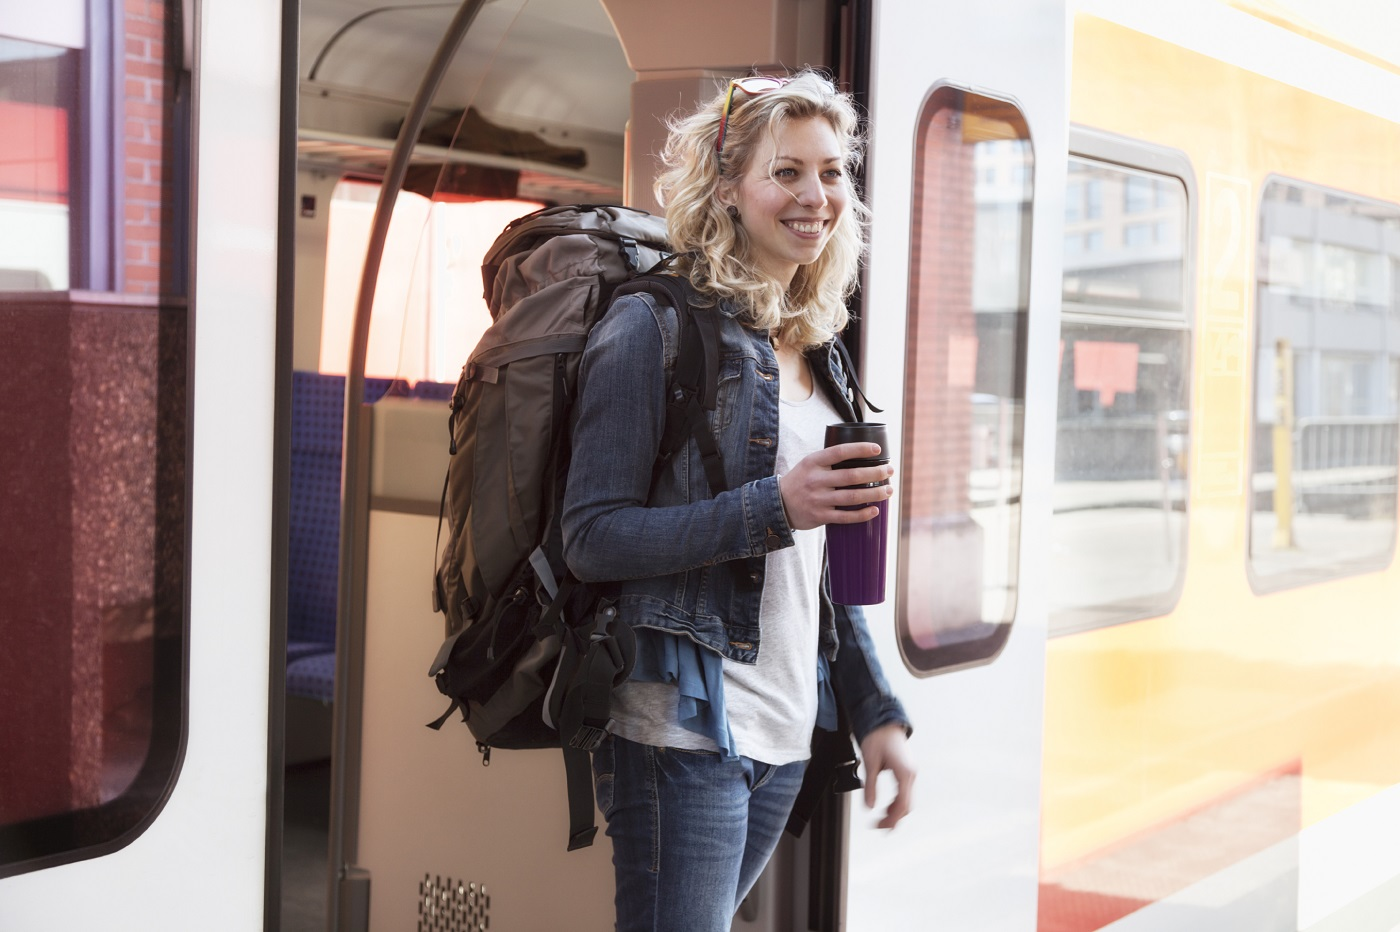 Getting off a train